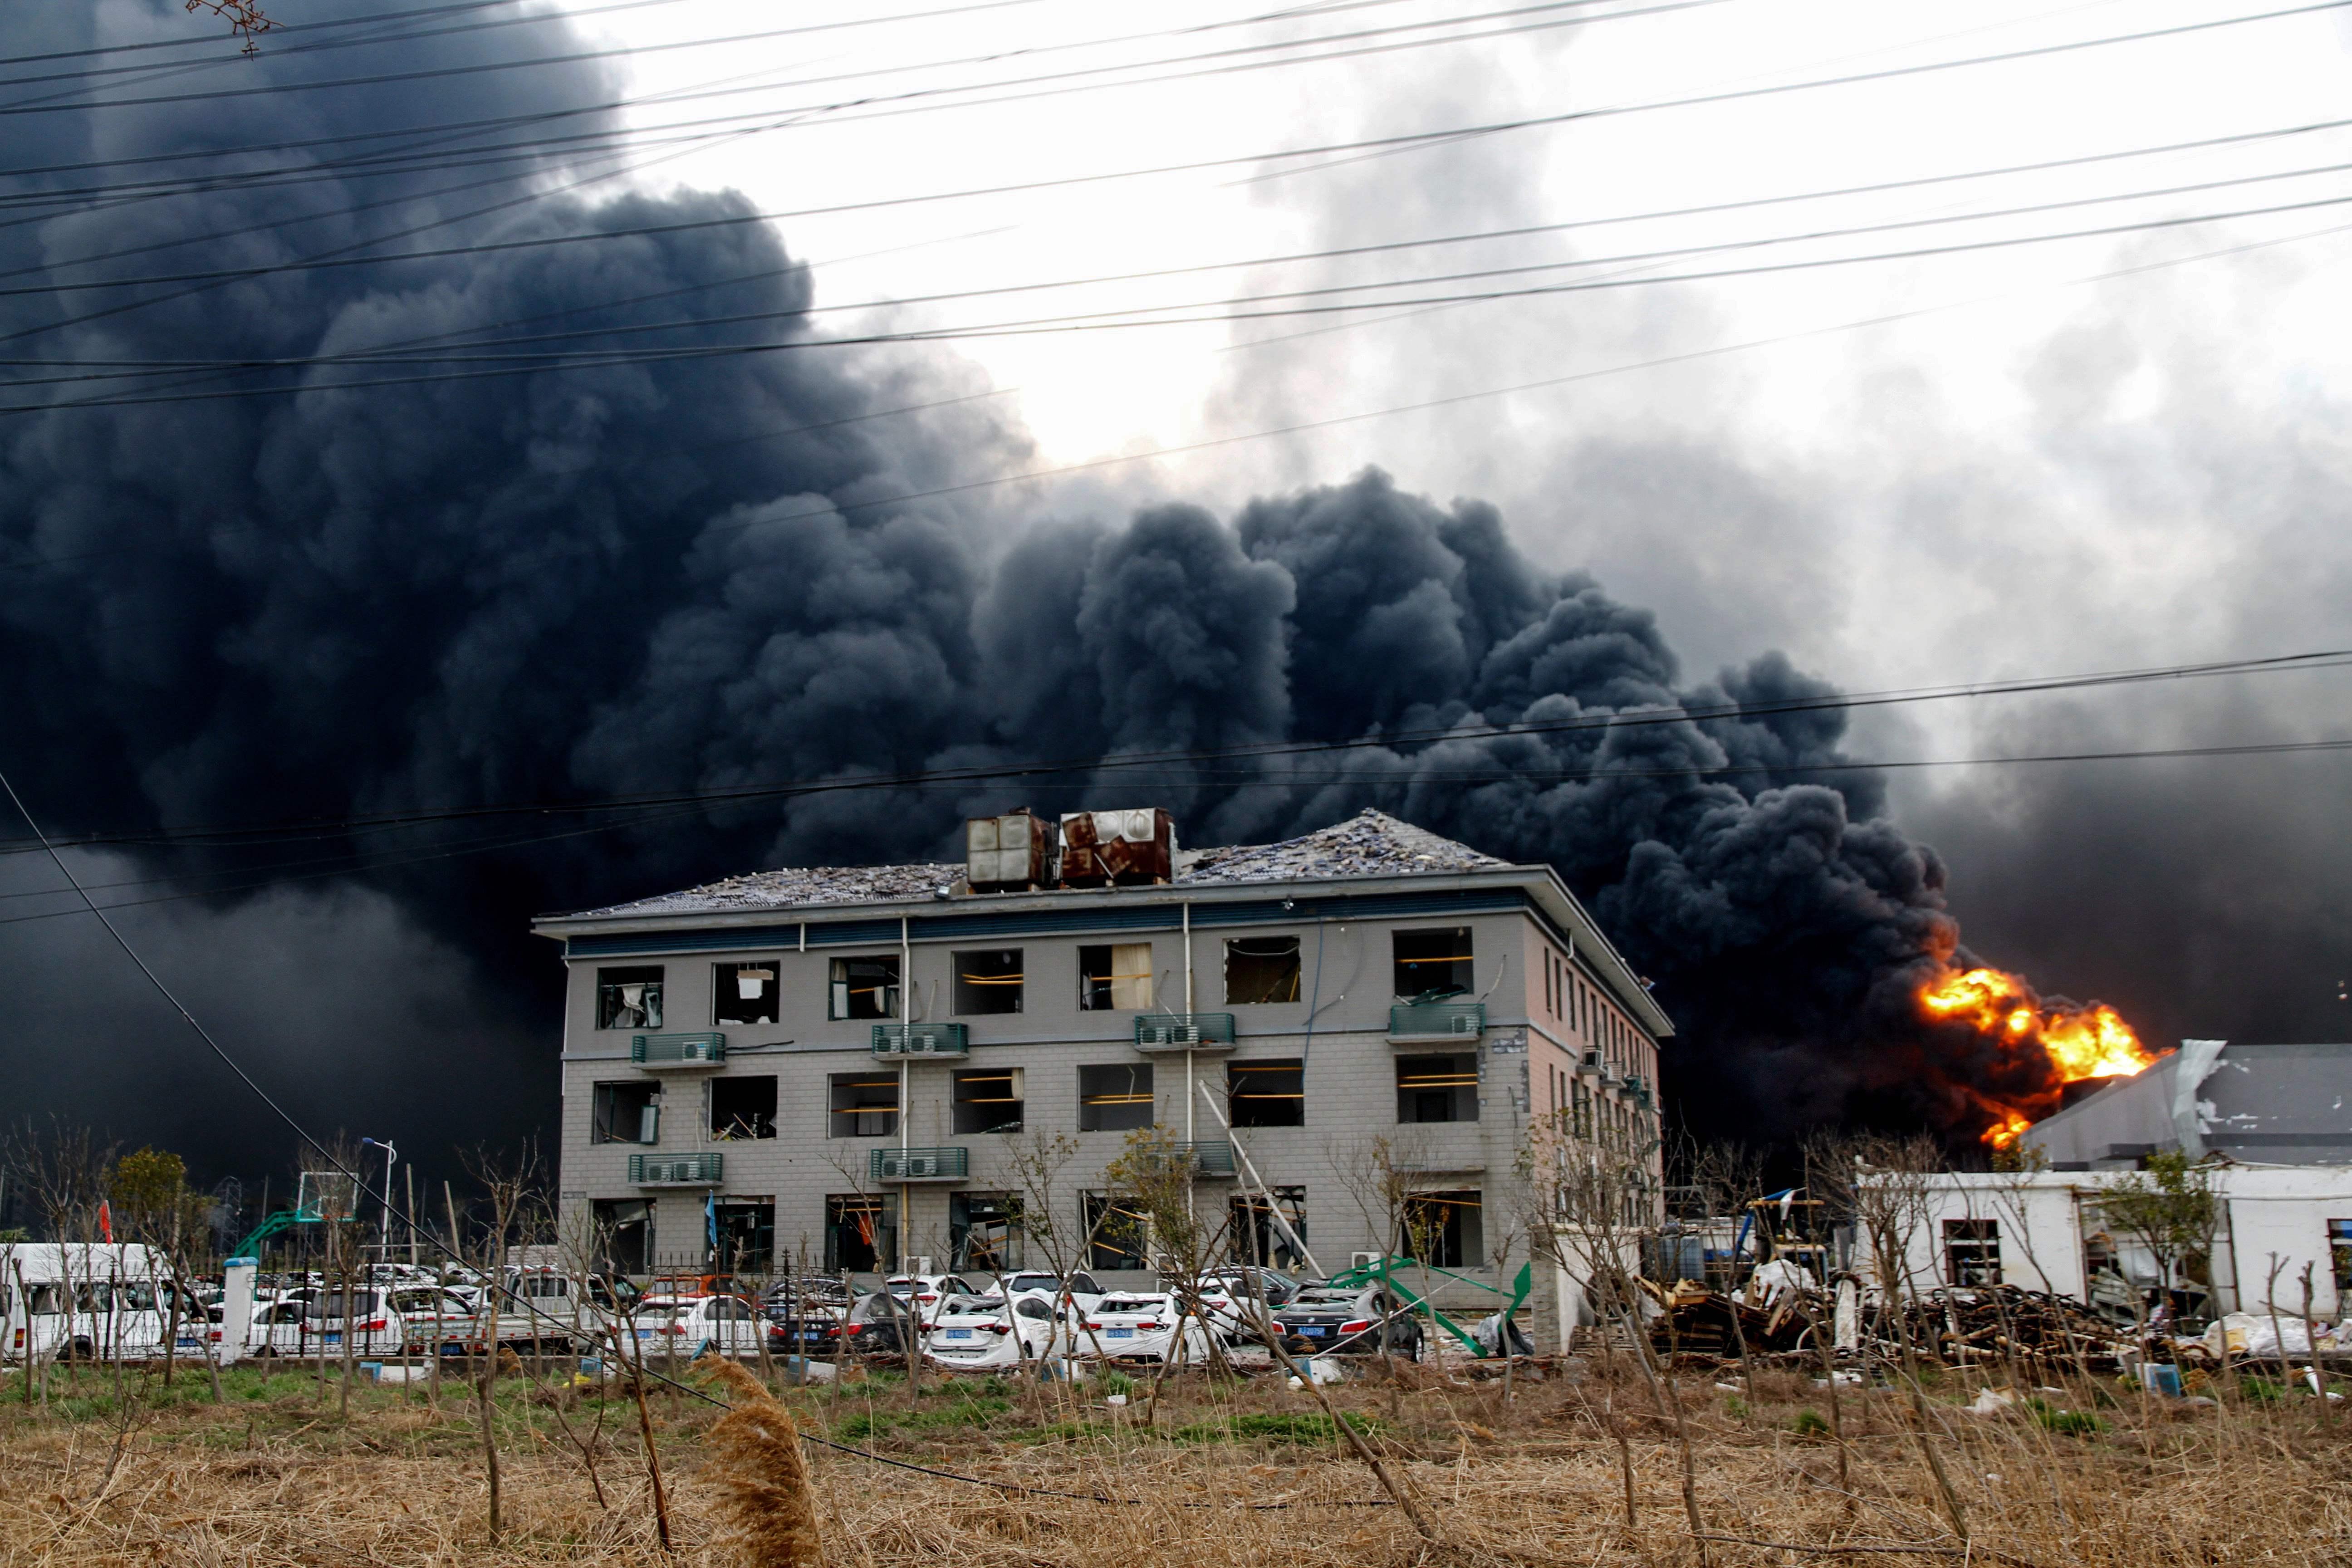 China chemical plant blast kills scores, injures hundreds